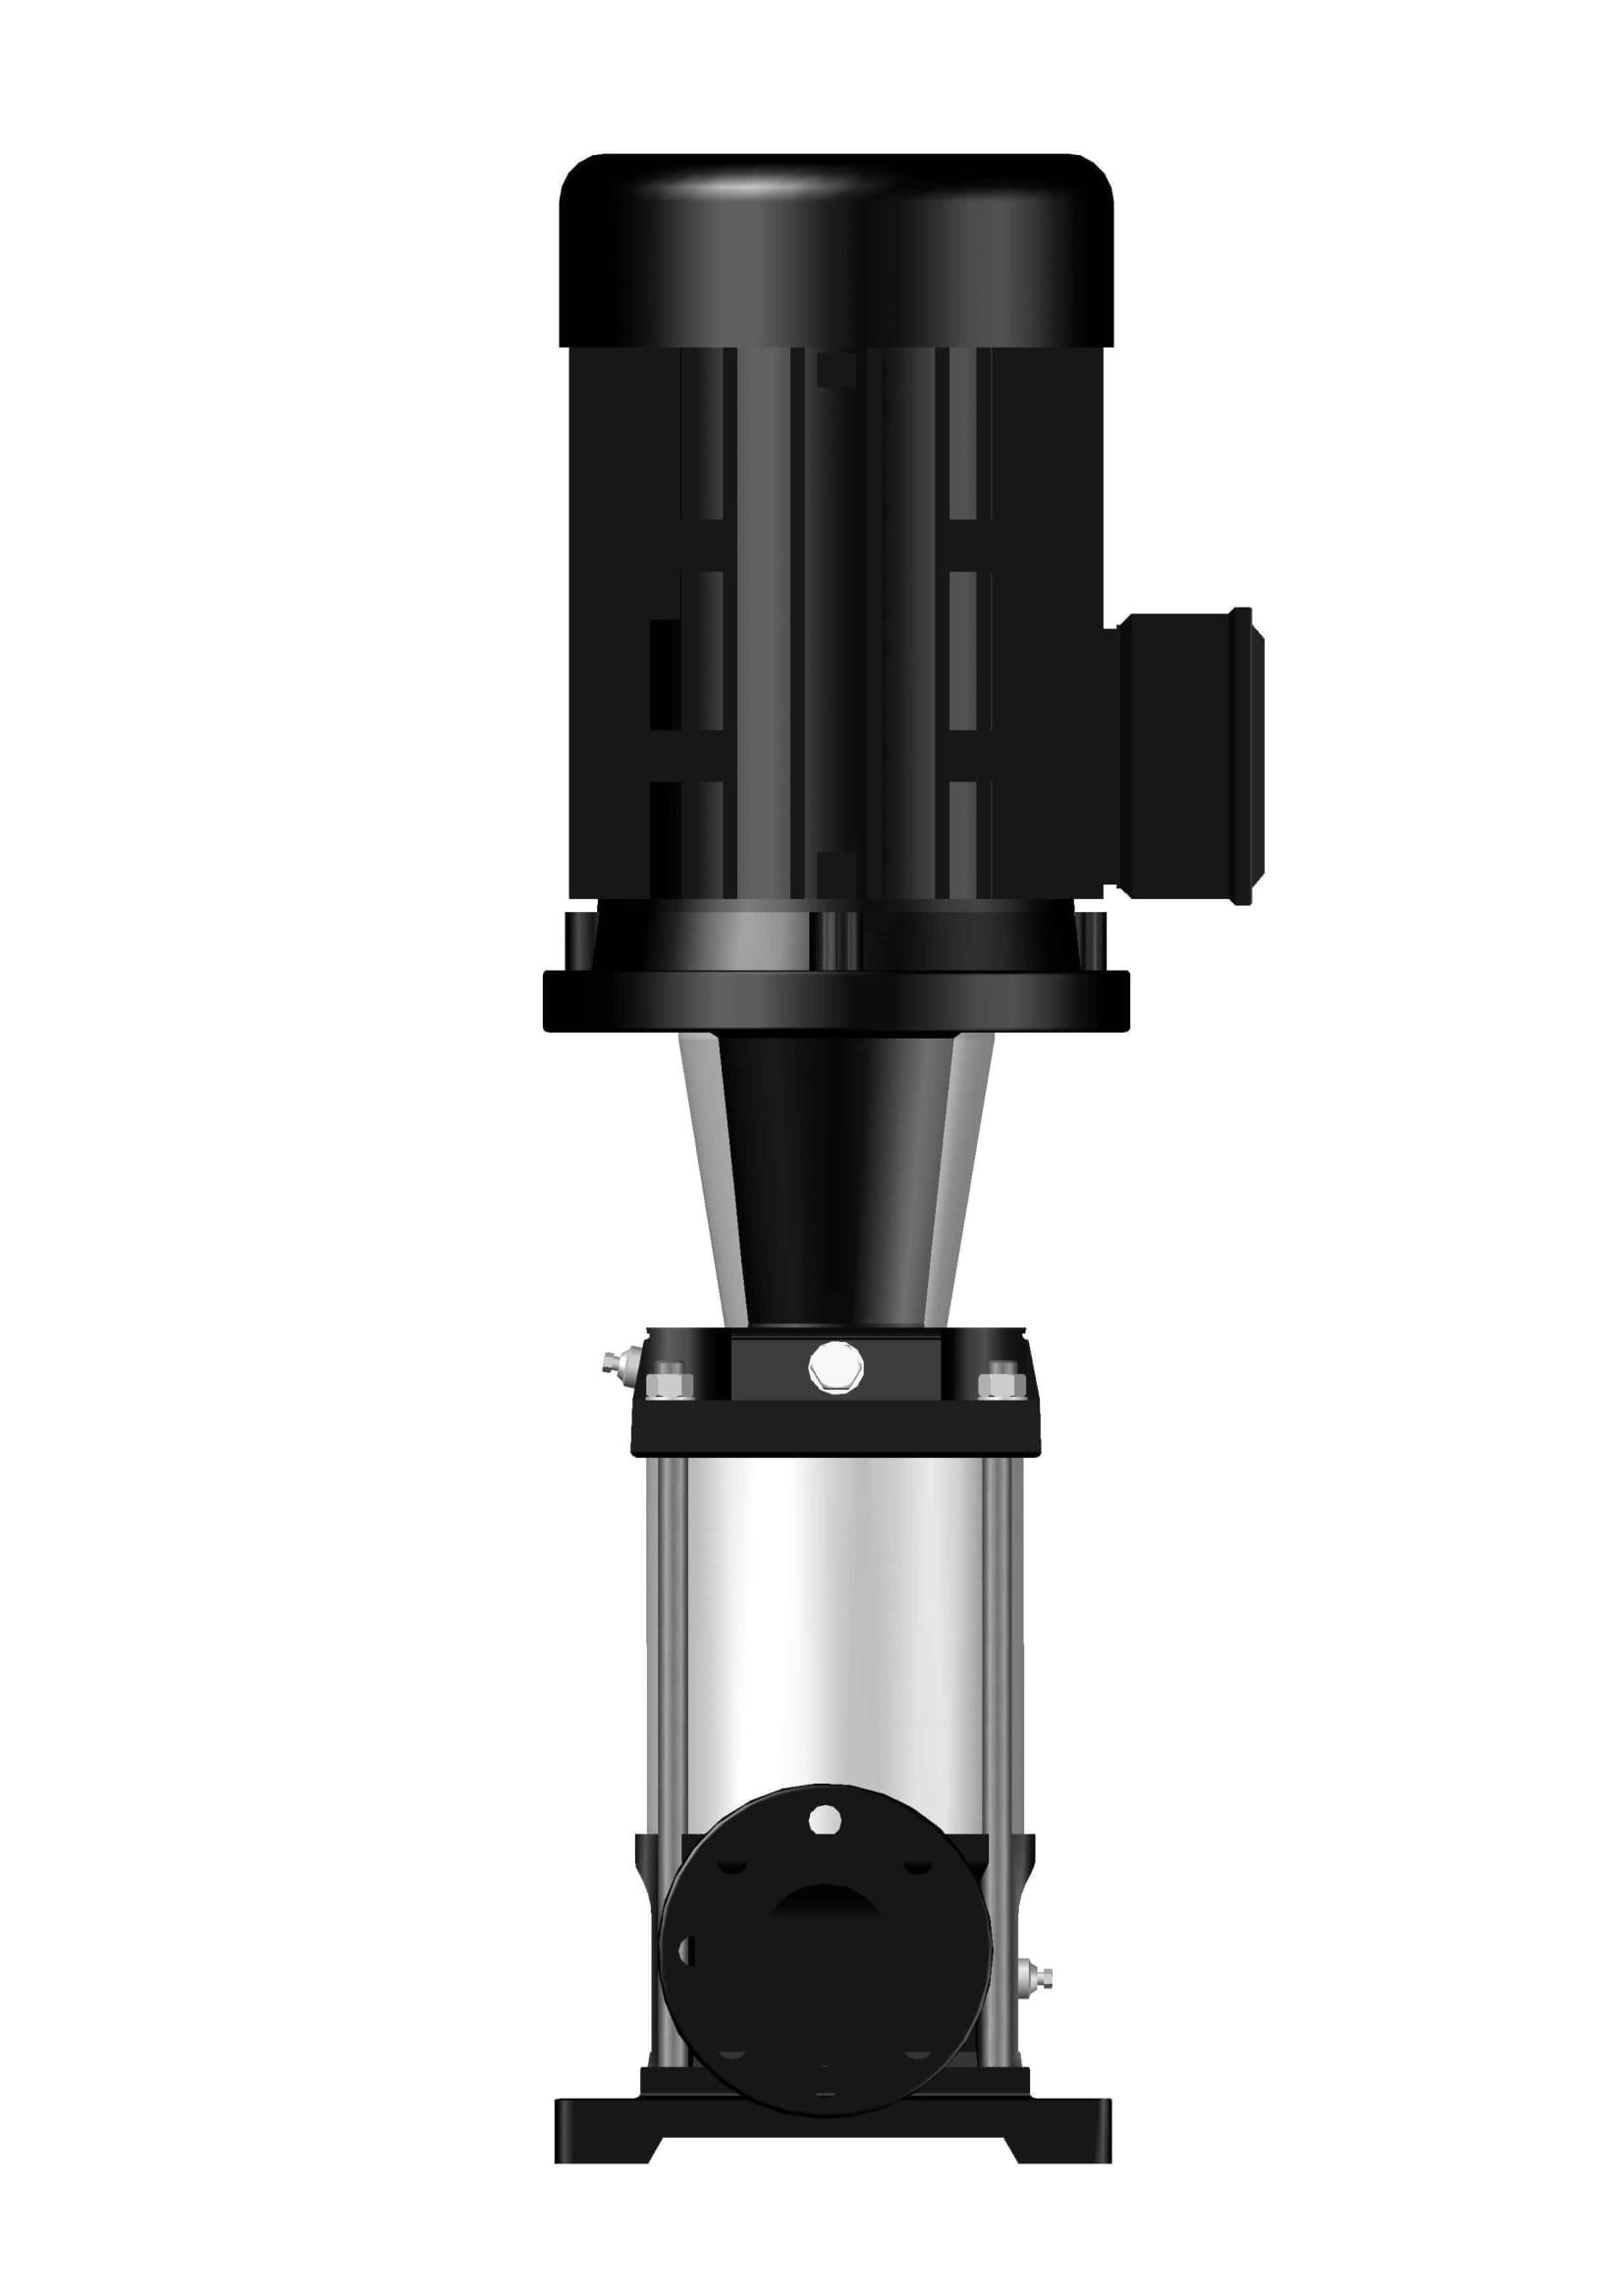 BV 45-03